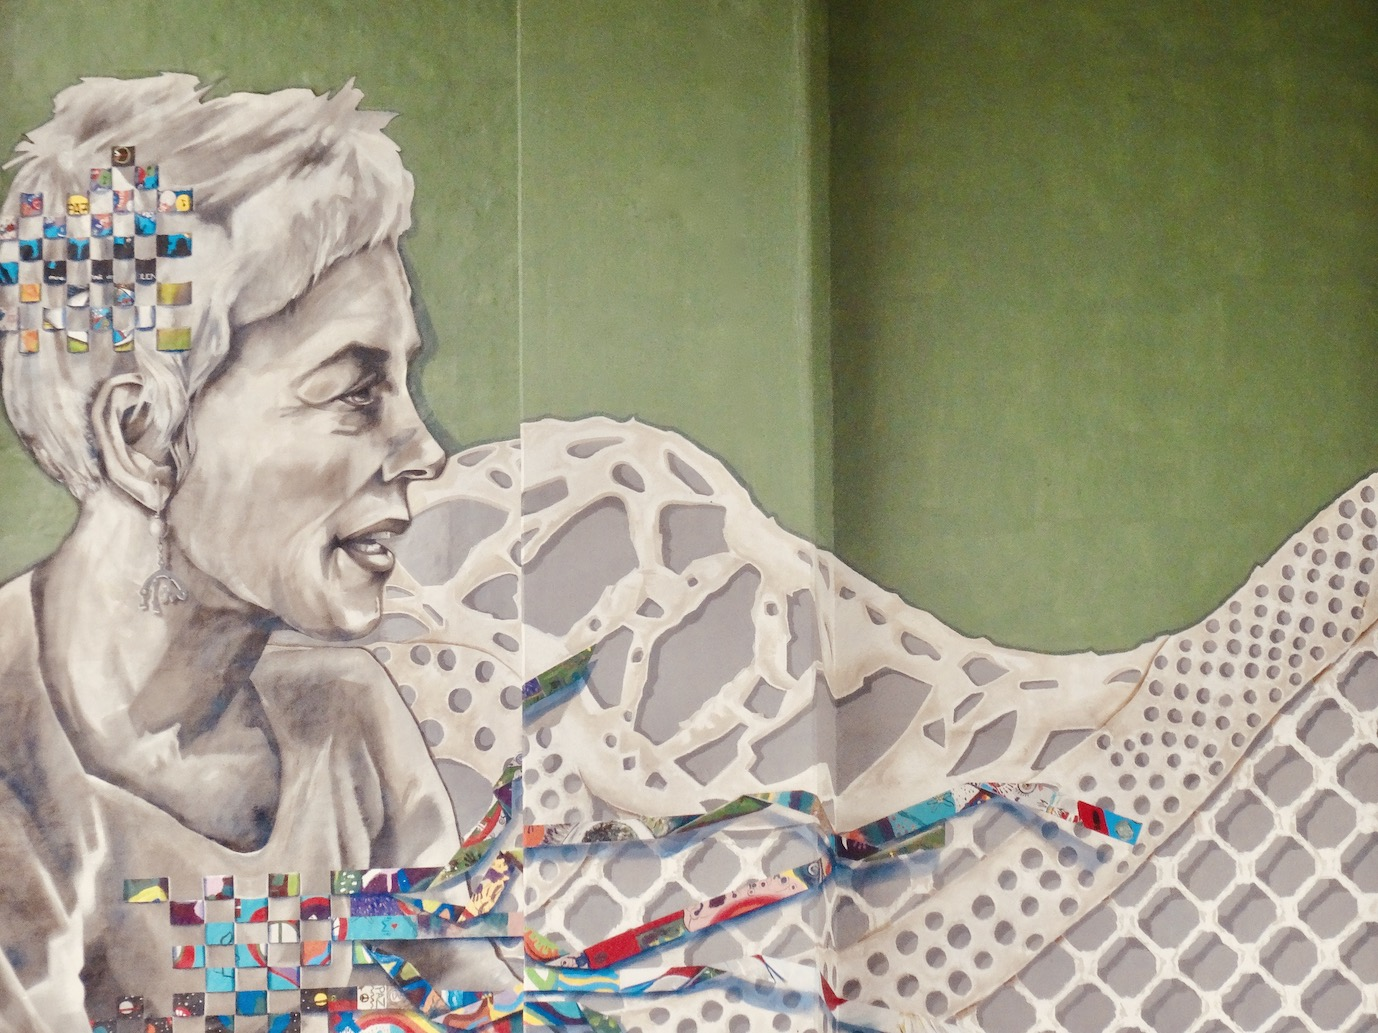 Art mural La Salve Bridge Bilbao.